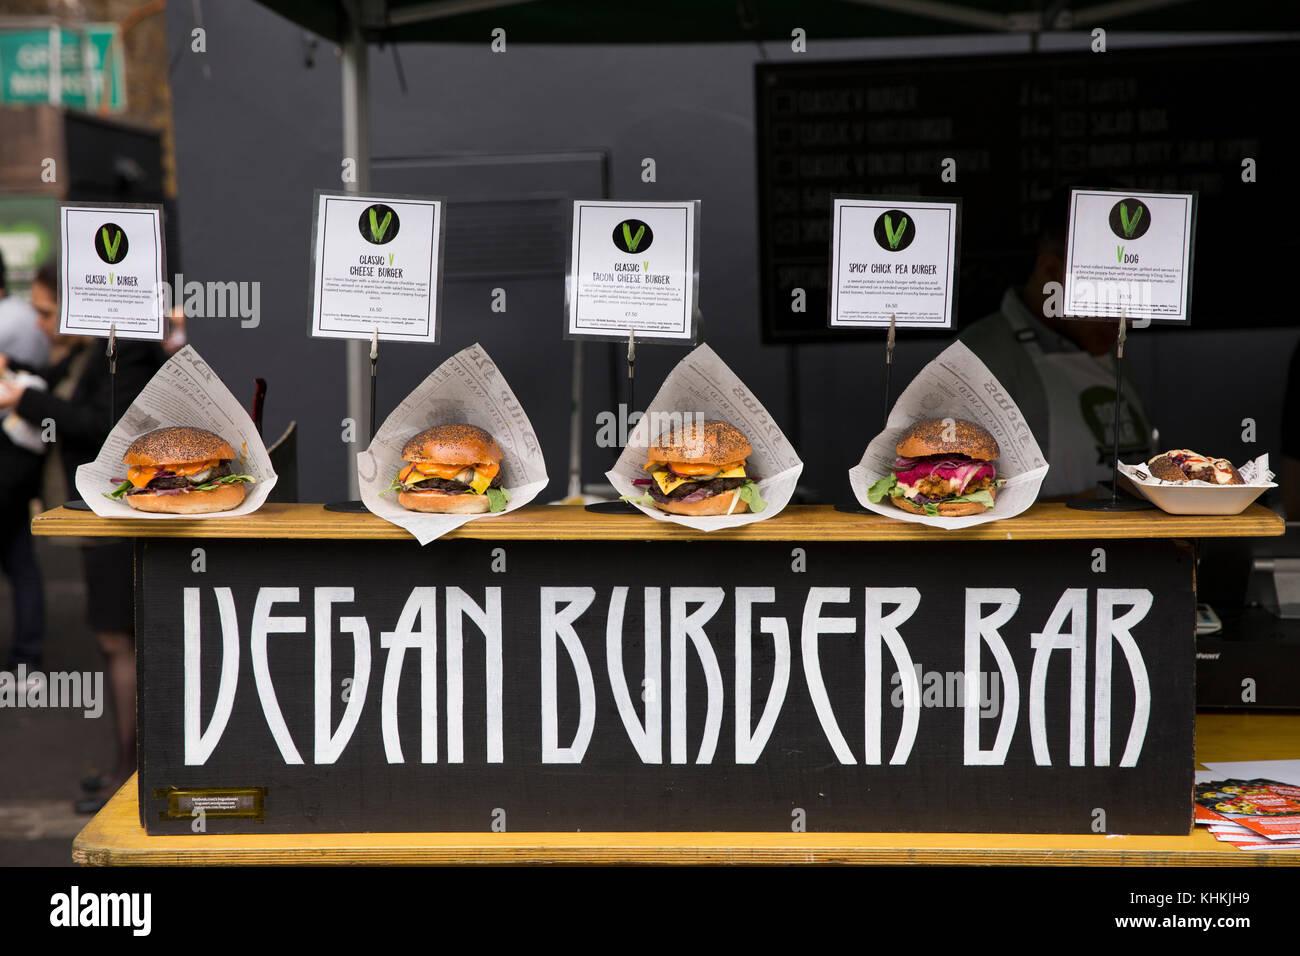 UK, London, Southwark, Borough Market, hot food stall, Vegan Burger Bar, different burgers on display - Stock Image